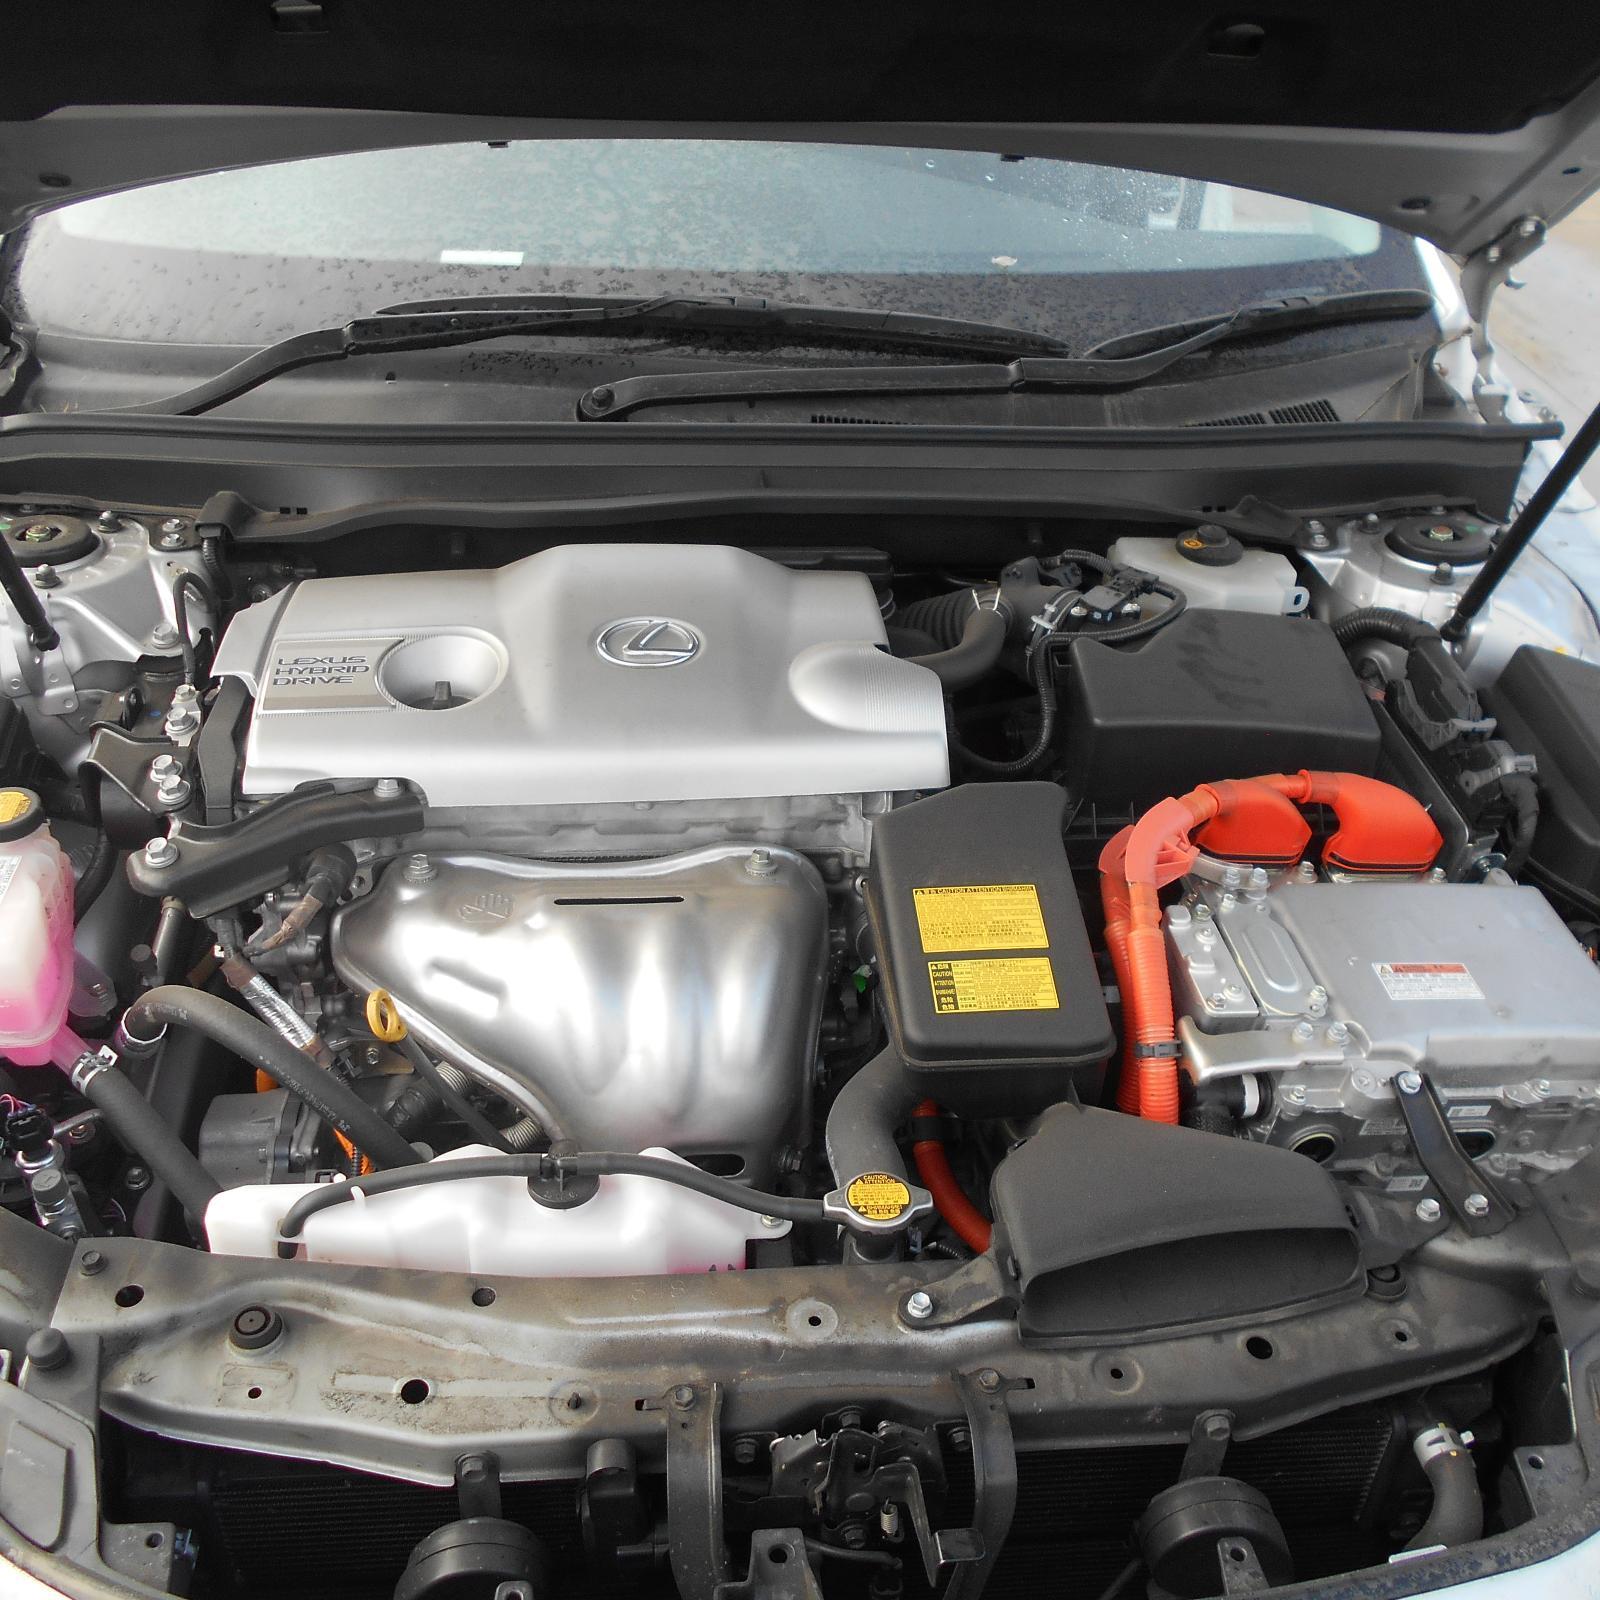 LEXUS ES SERIES (13-), Engine, PETROL, 2.5, 2AR, HYBRID, ES300H, AVV60R/GSV60R, 11/13-07/18